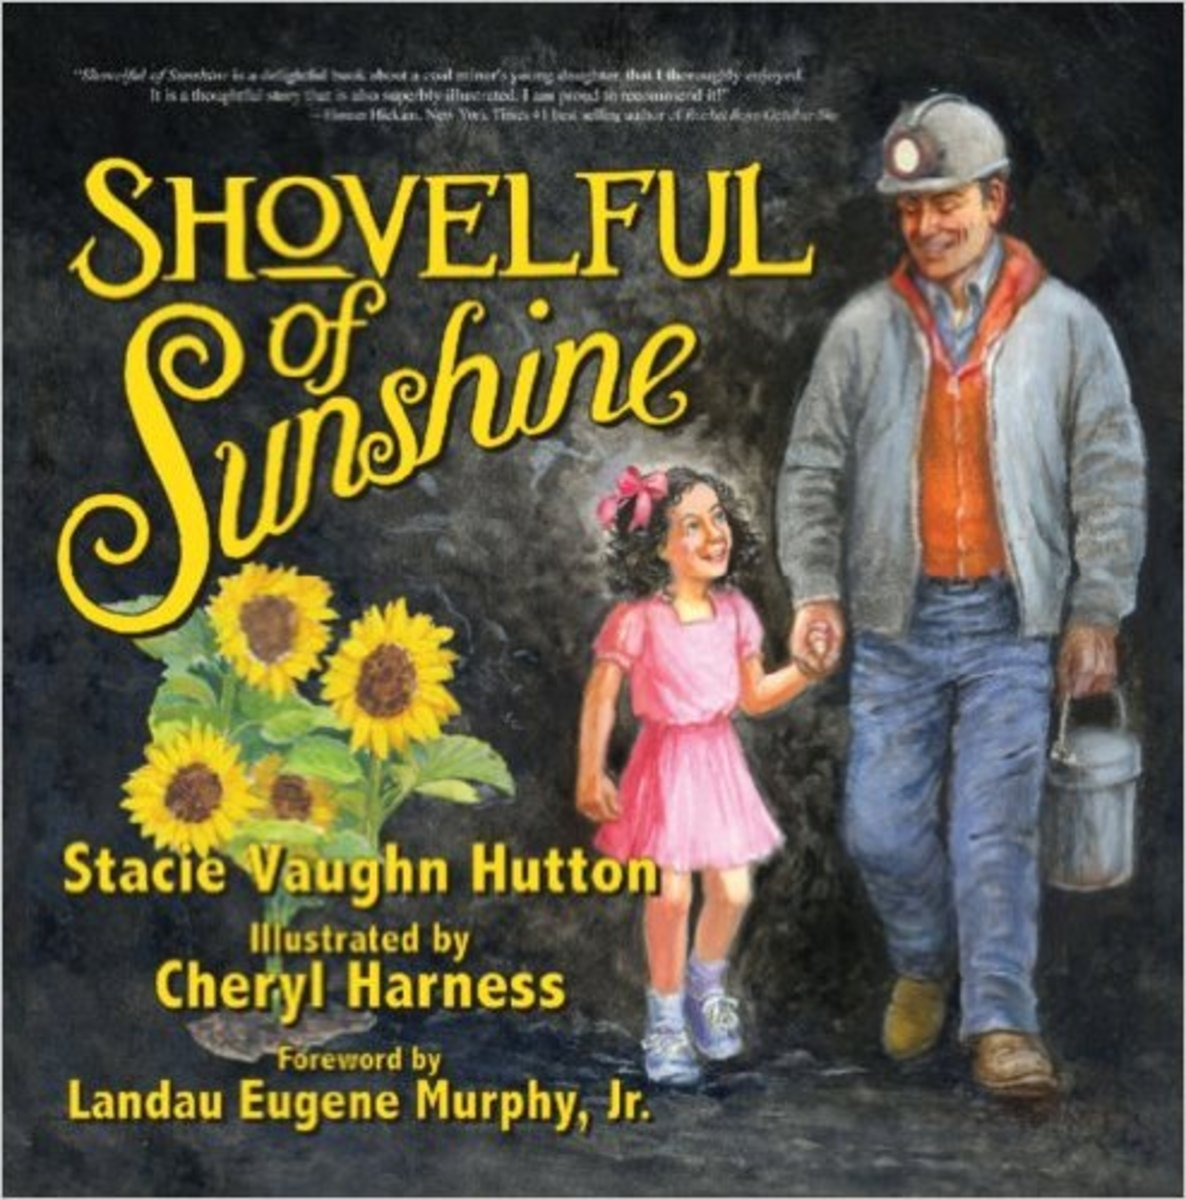 Shovelful of Sunshine (Mom's Choice Award Recipient) by Stacie Vaughn Hutton